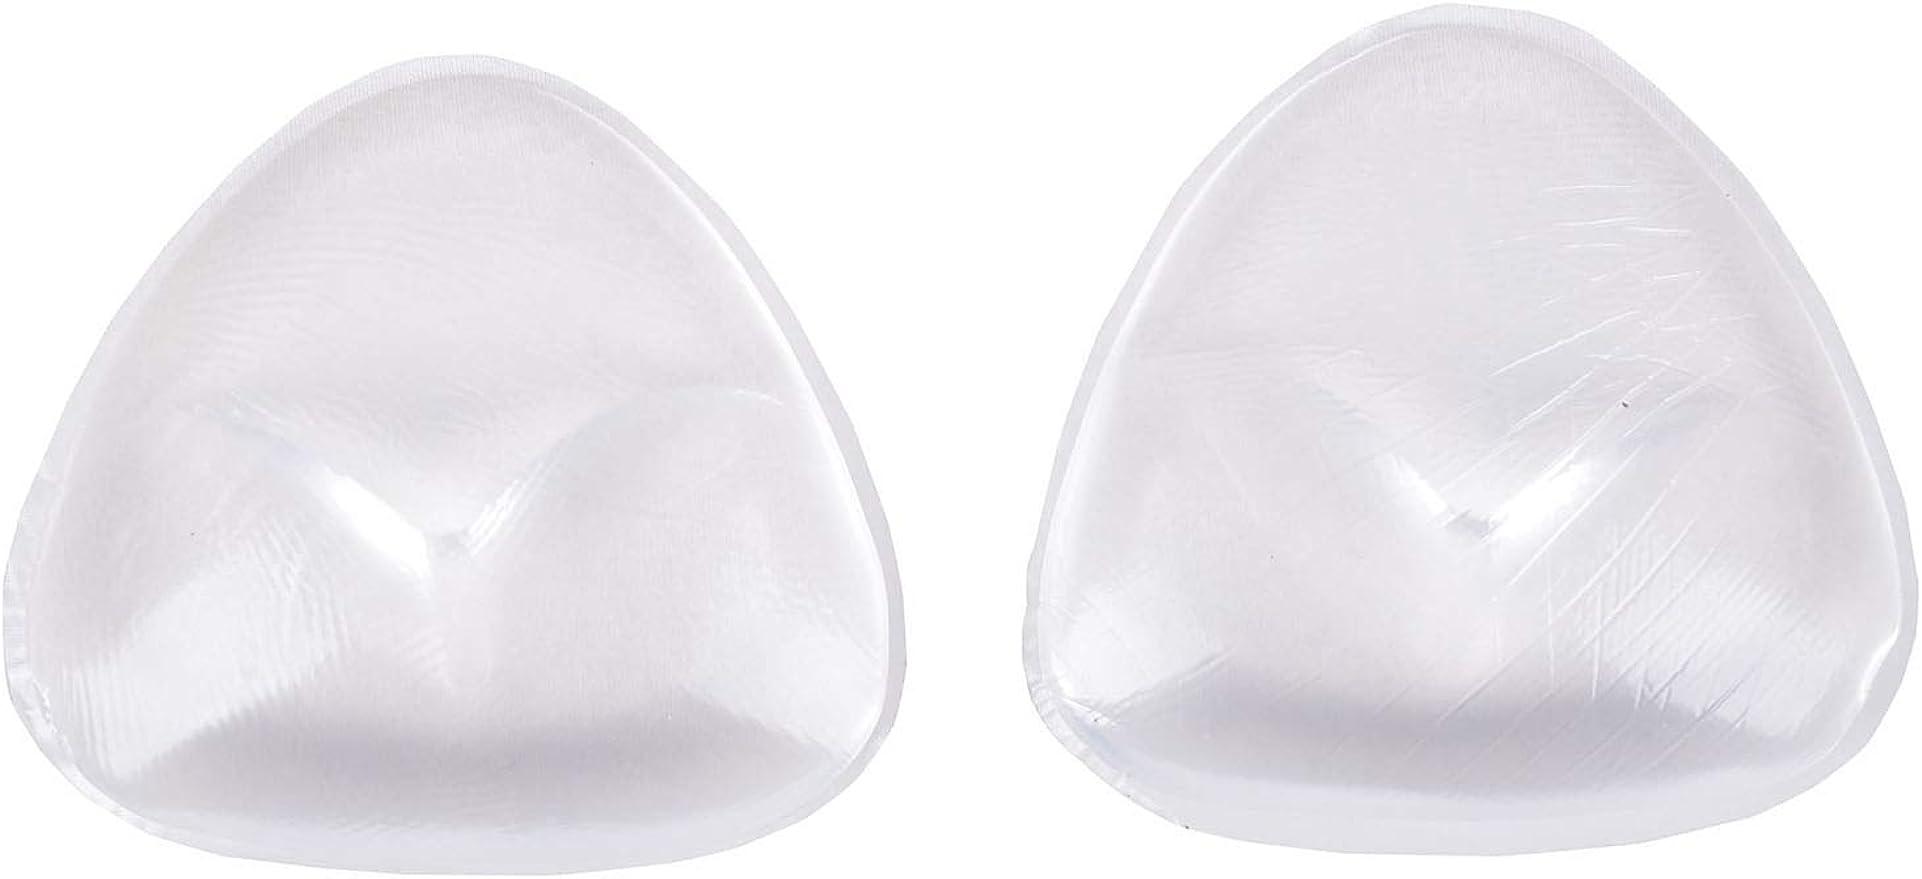 Pair Soft Bikini Bra Insert//Silicone Triangle Pads Enhancer//Swimsuit Push-up BZ